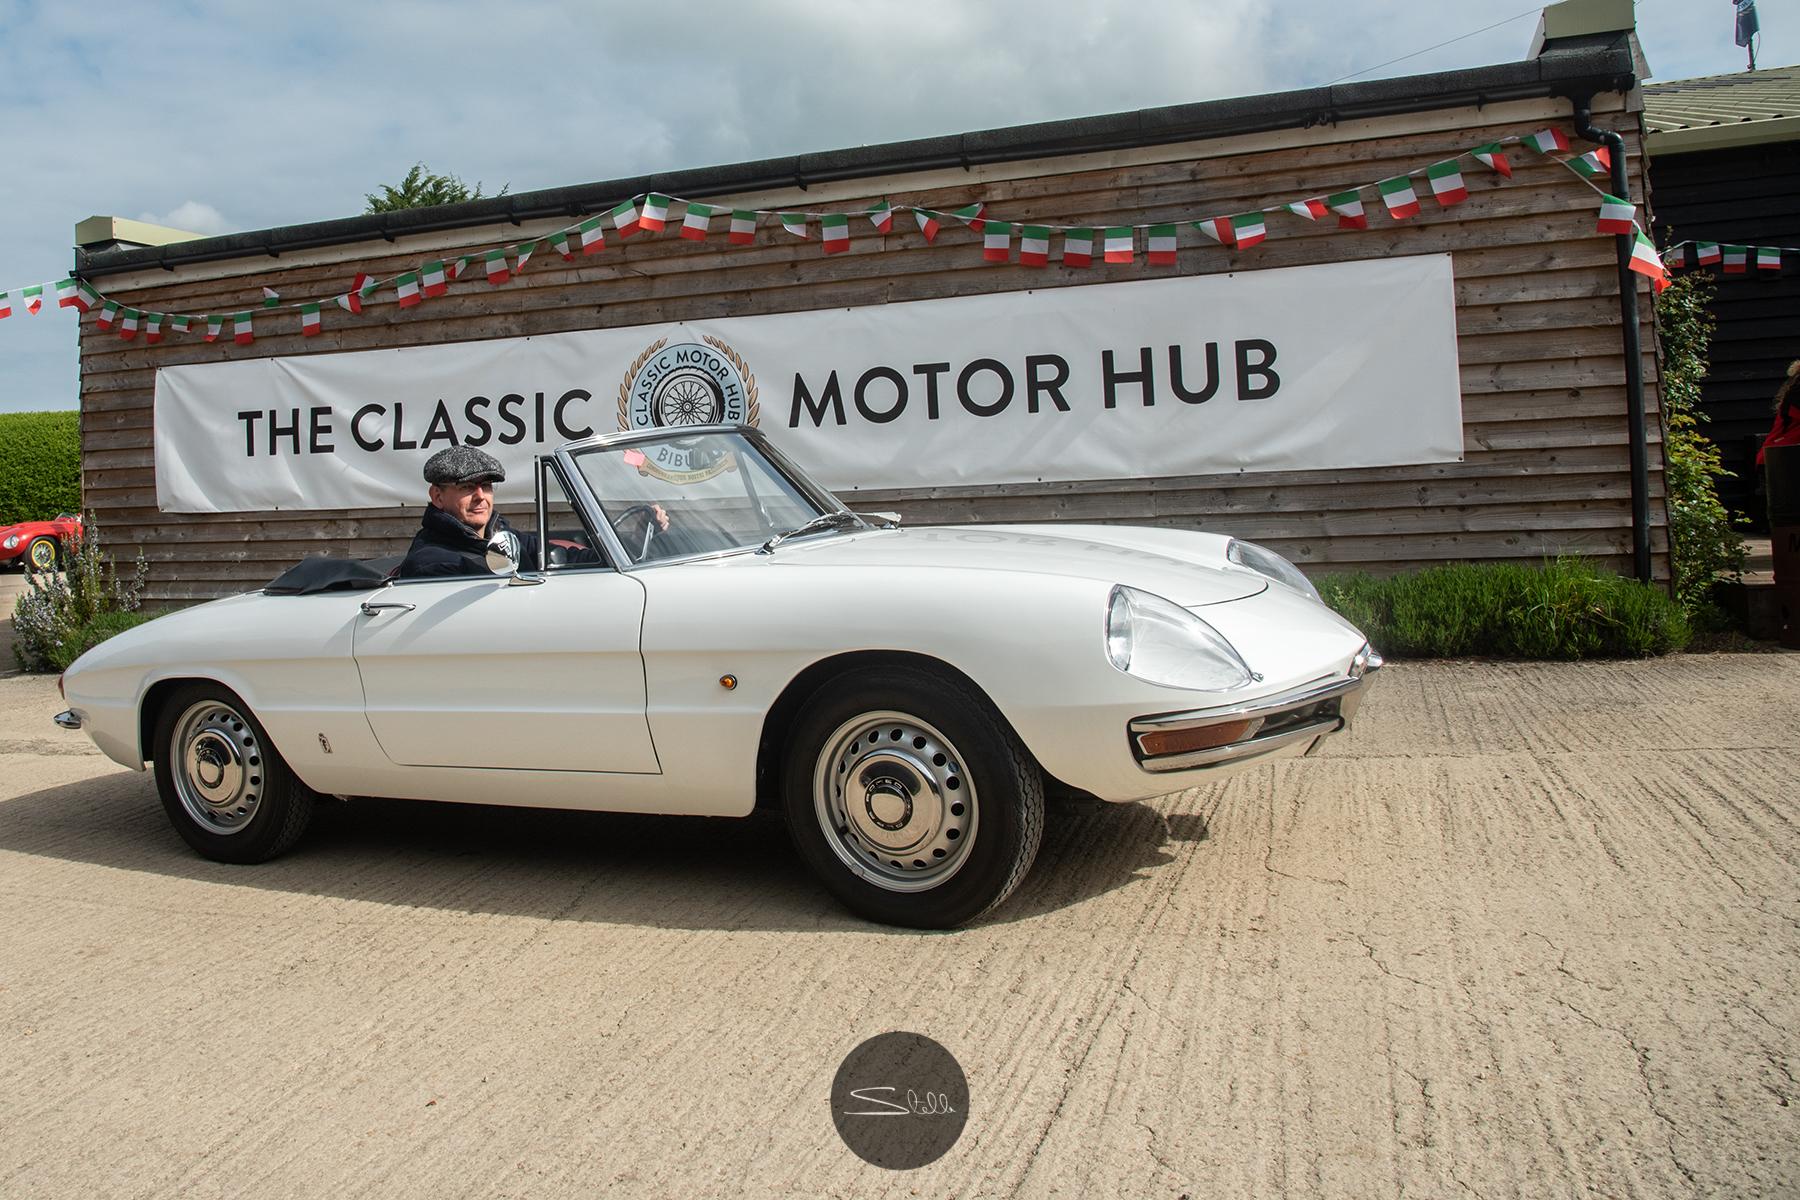 Stella Scordellis -20190505 The Classic Motor Hub089c.jpg